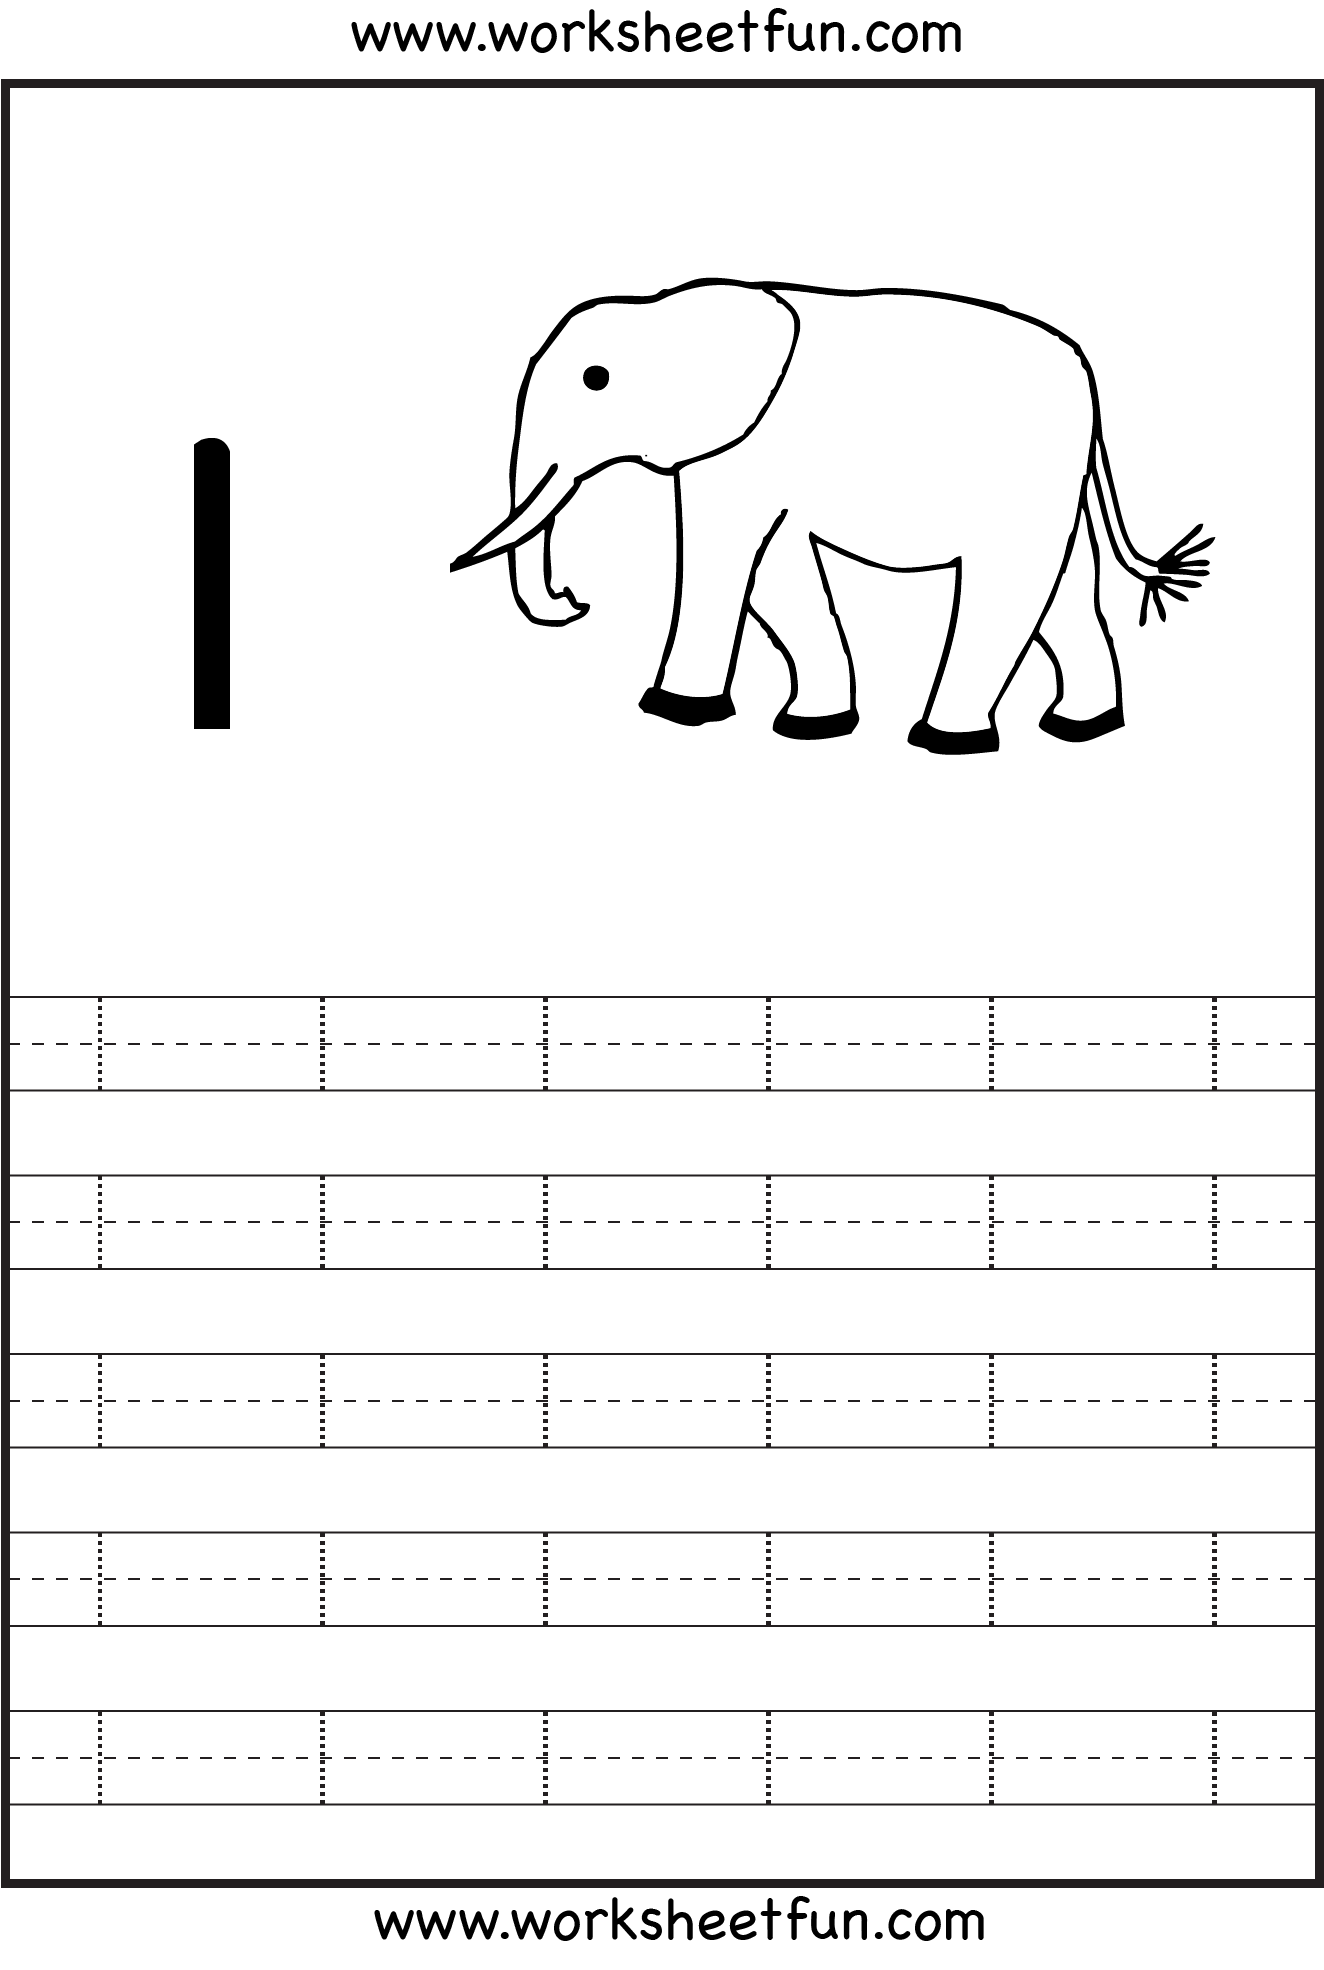 Worksheets Preschool Number 1 Worksheets 1000 images about number worksheets on pinterest tracing free printable and worksheets